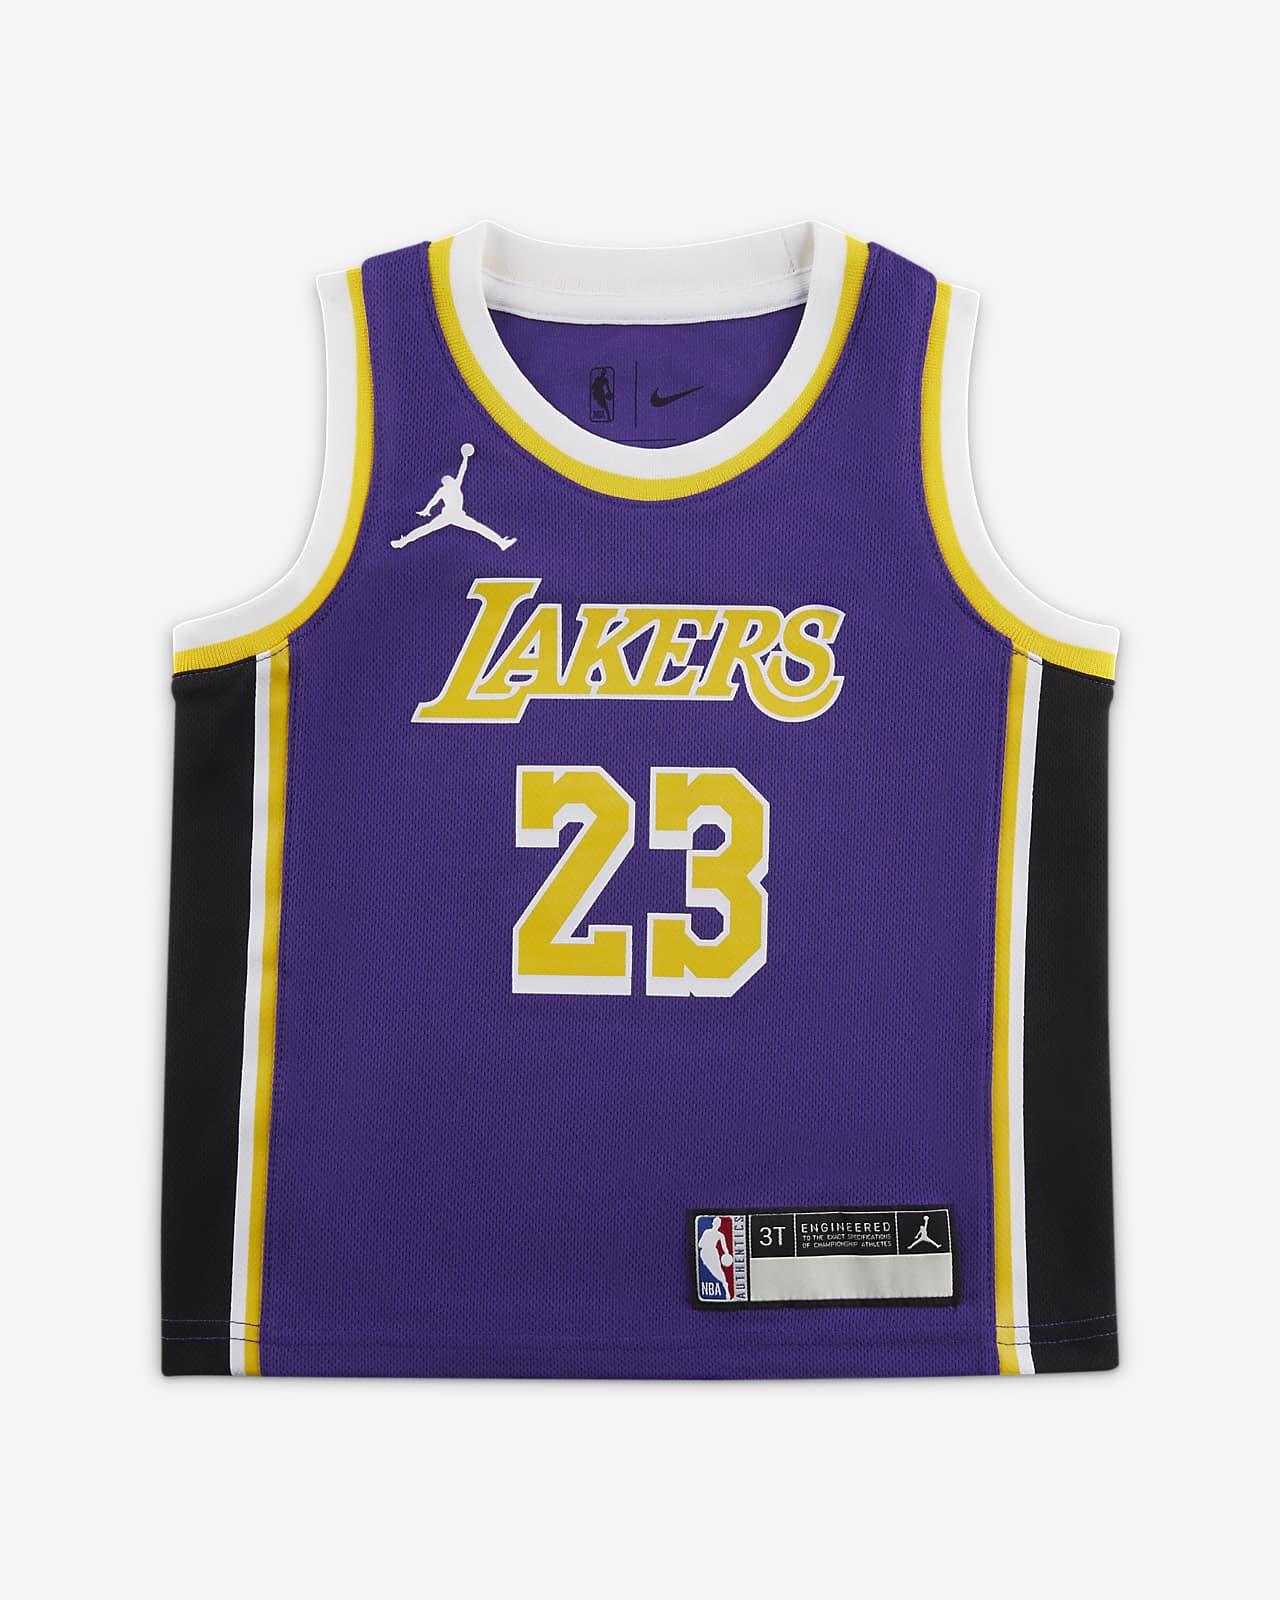 洛杉矶湖人队 Statement Edition Jordan NBA Swingman Jersey 婴童球衣